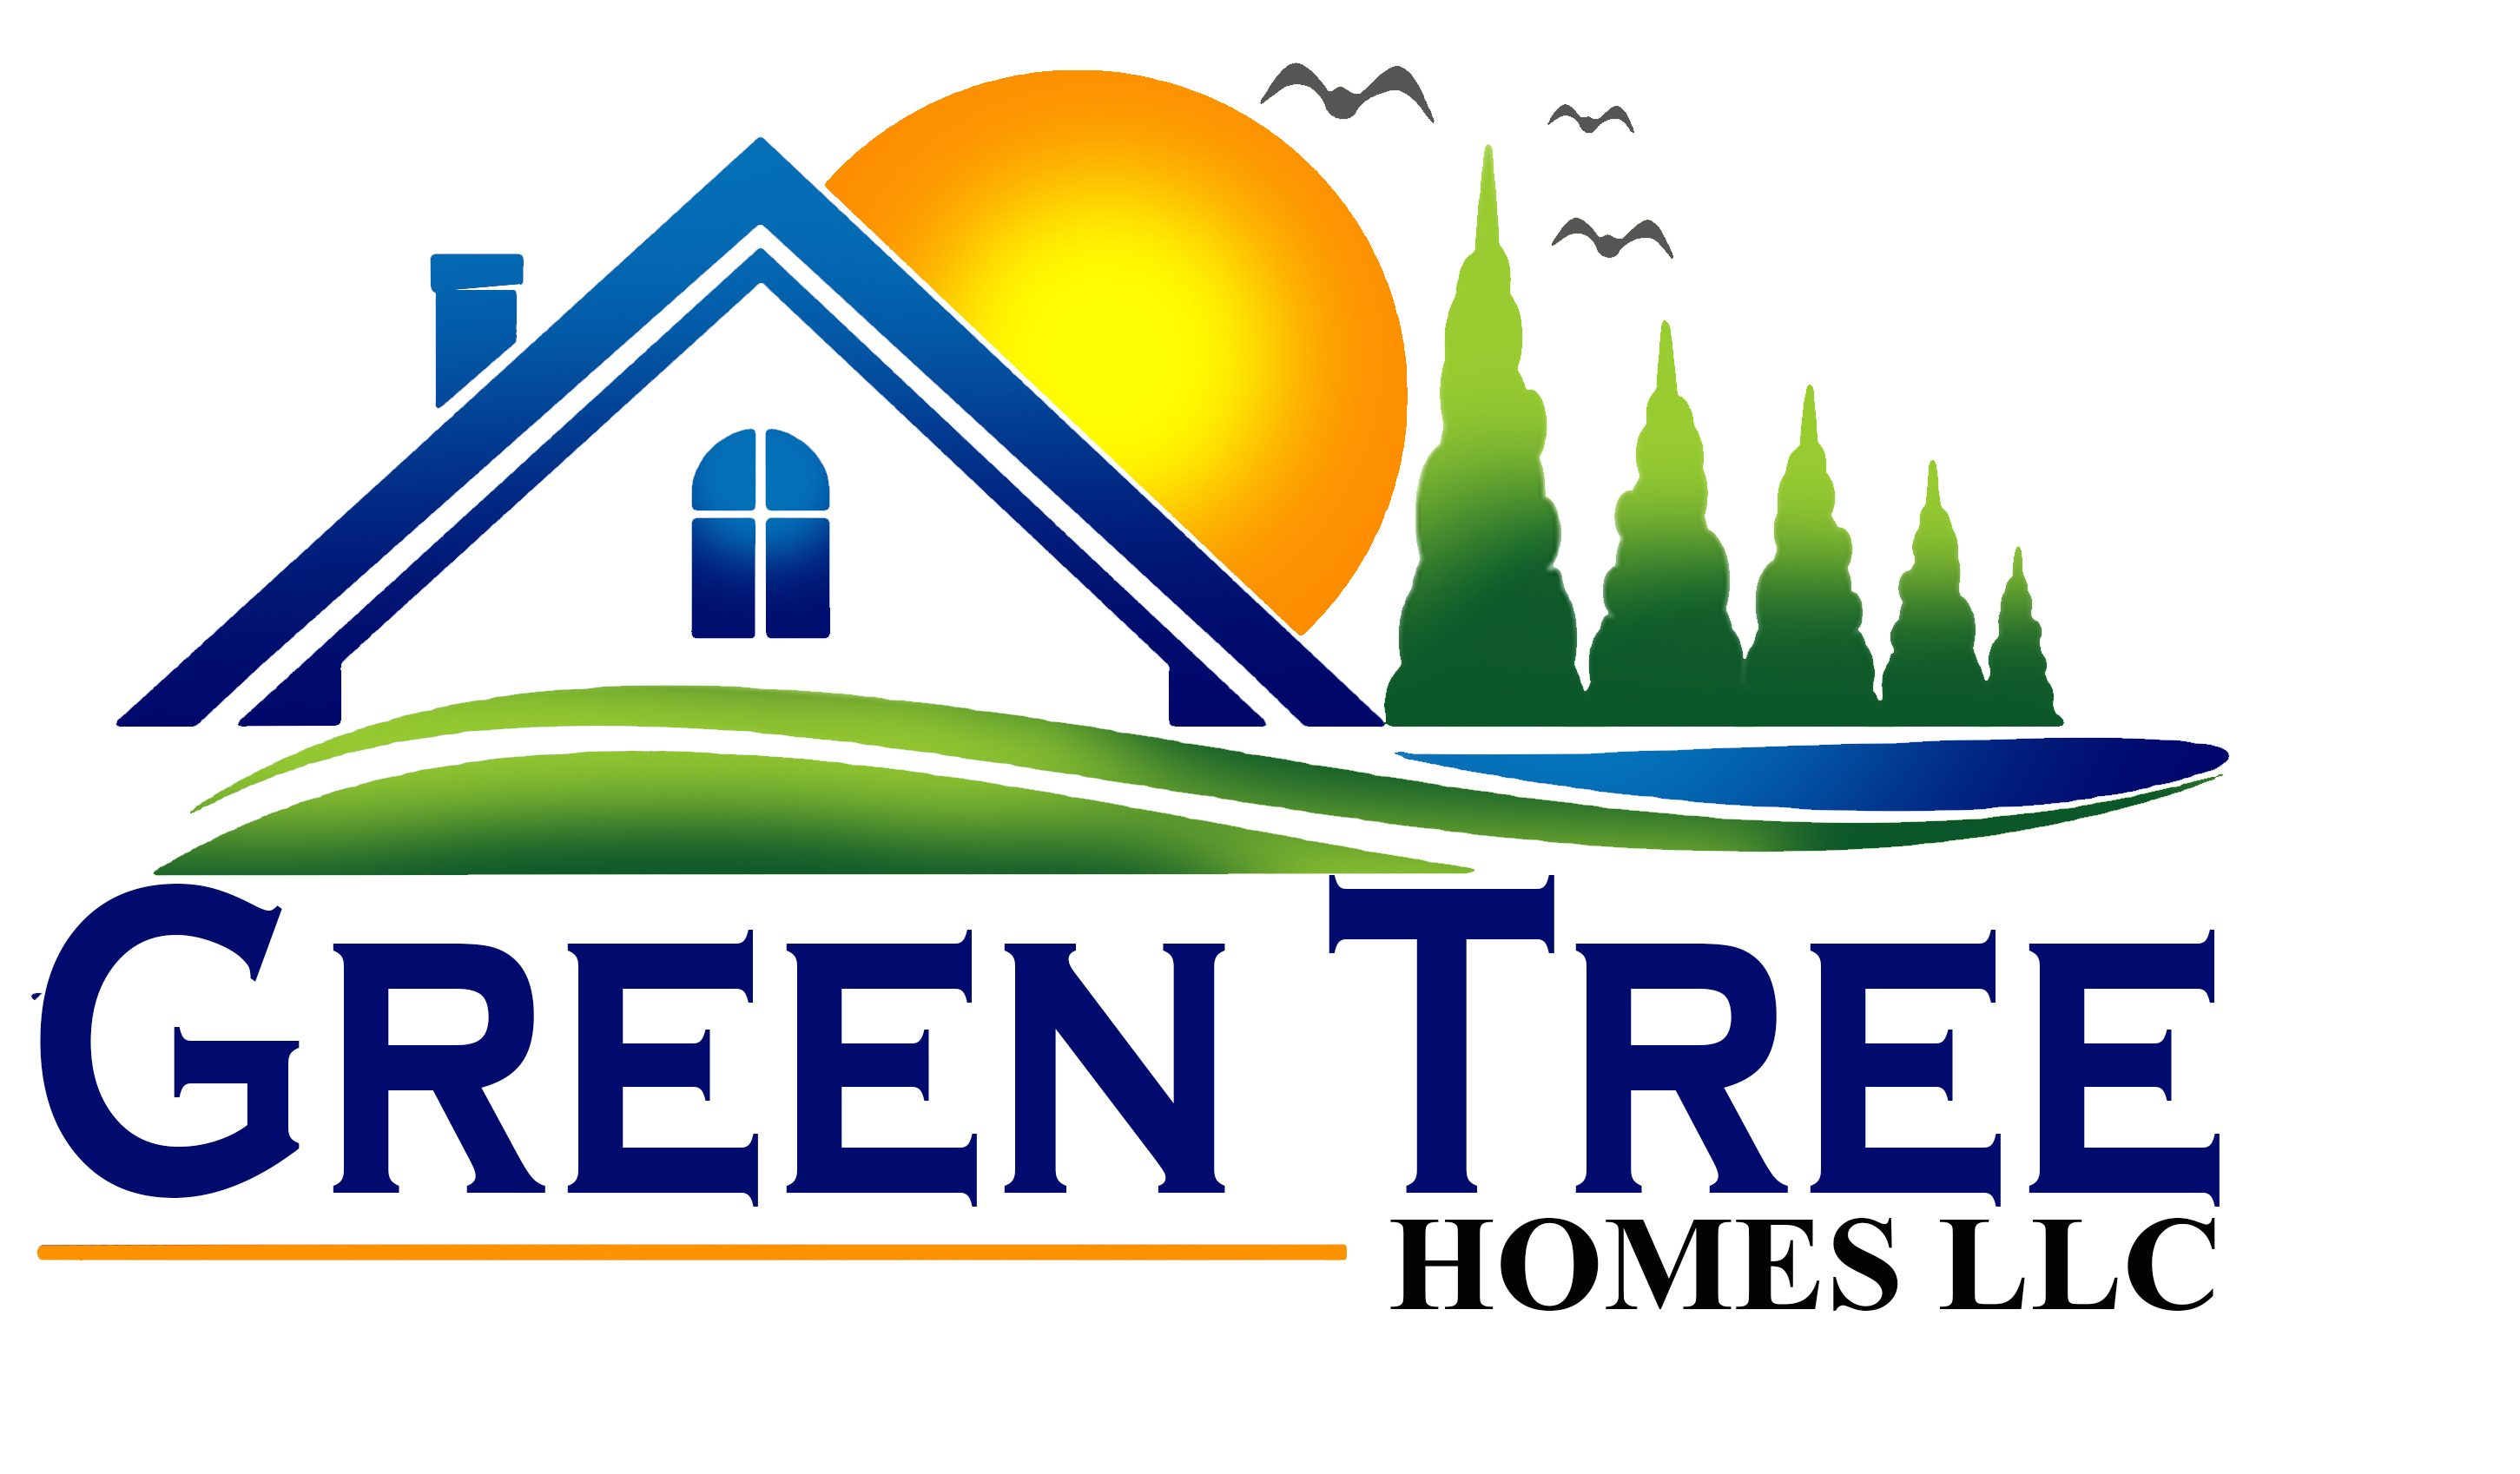 Green Tree Homes LLC